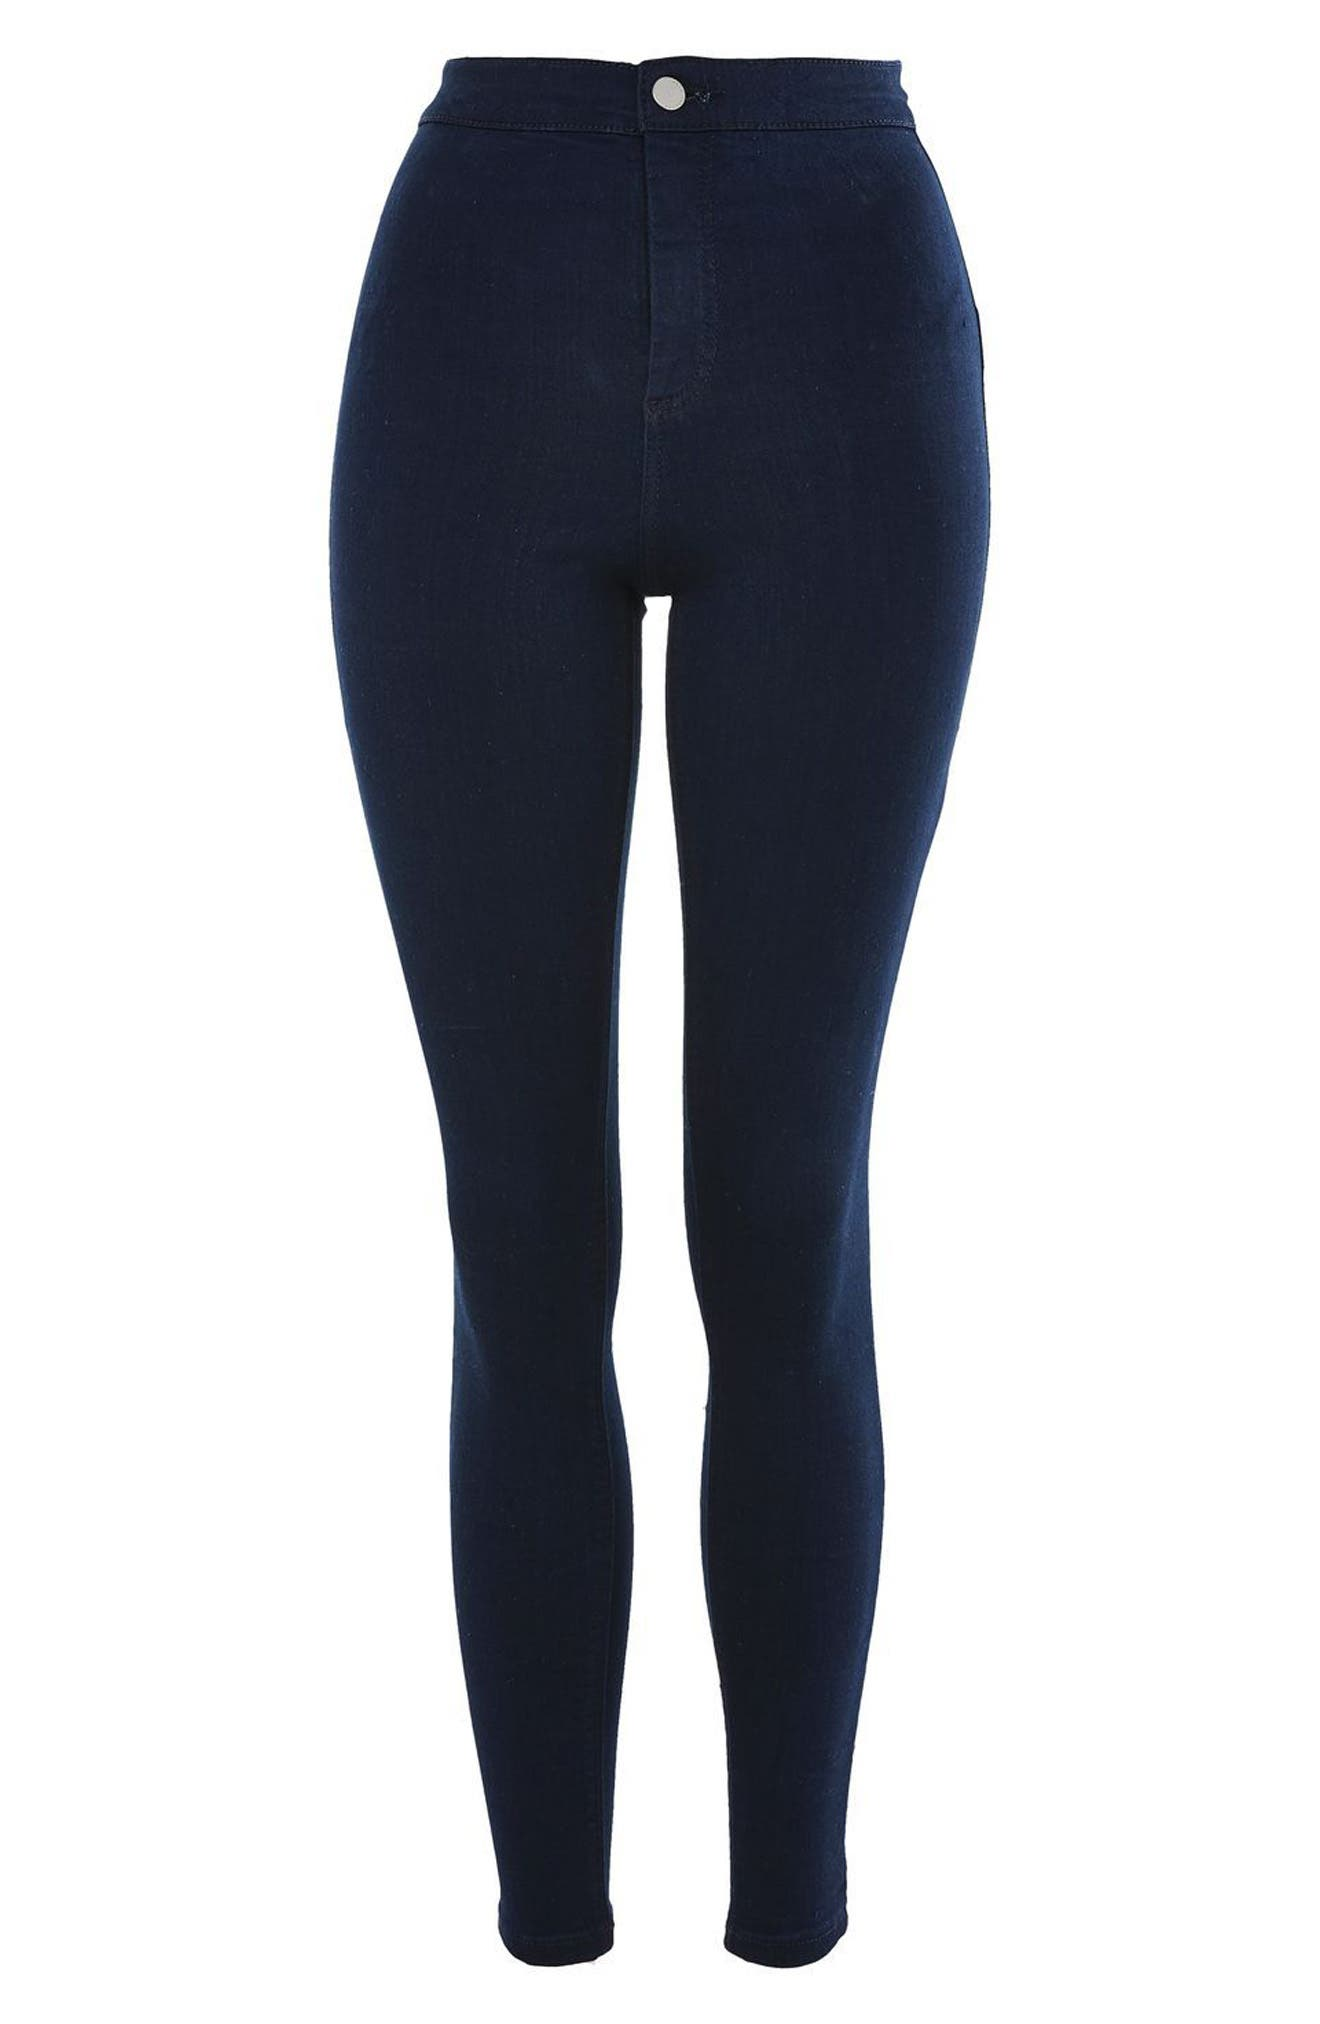 TOPSHOP, Joni High Waist Skinny Jeans, Alternate thumbnail 3, color, DARK INDIGO